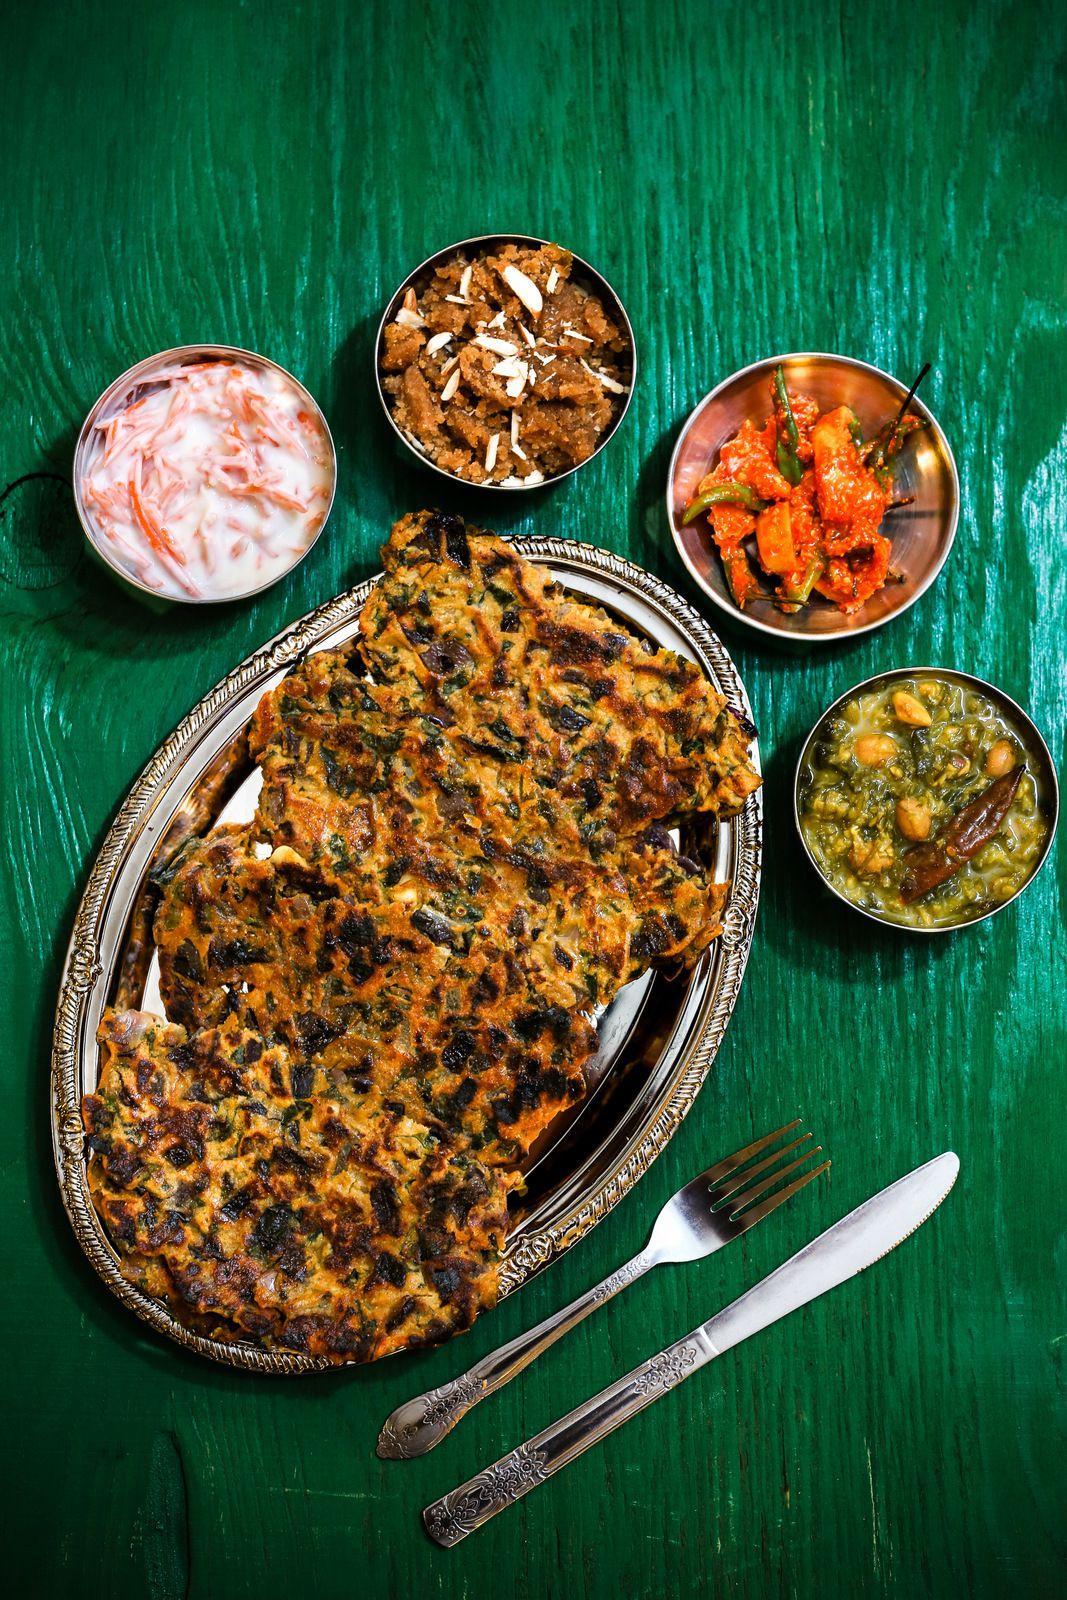 Thalipeeth ghavacha sheera shepuchi bhaji recipe multigrain thalipeeth recipe shepuchi bhaji recipe ghavacha sheera recipe marathi recipes marathi food easy recipes indian recipes how to make thalipeeth food forumfinder Gallery